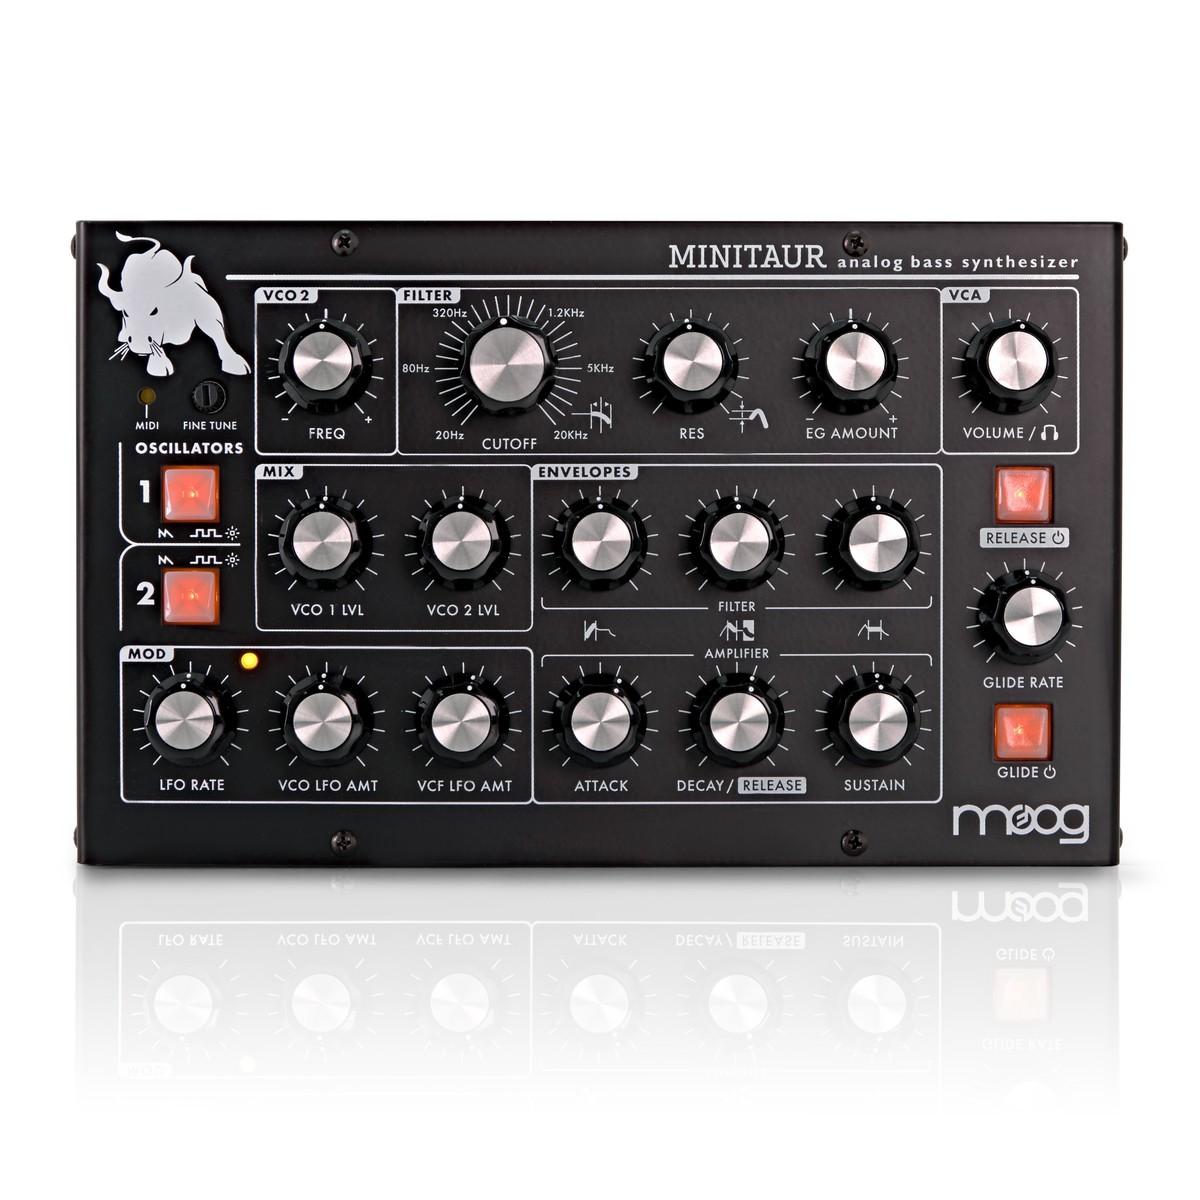 Shop now   Moog MINITAUR Analog Bass Synthesizer